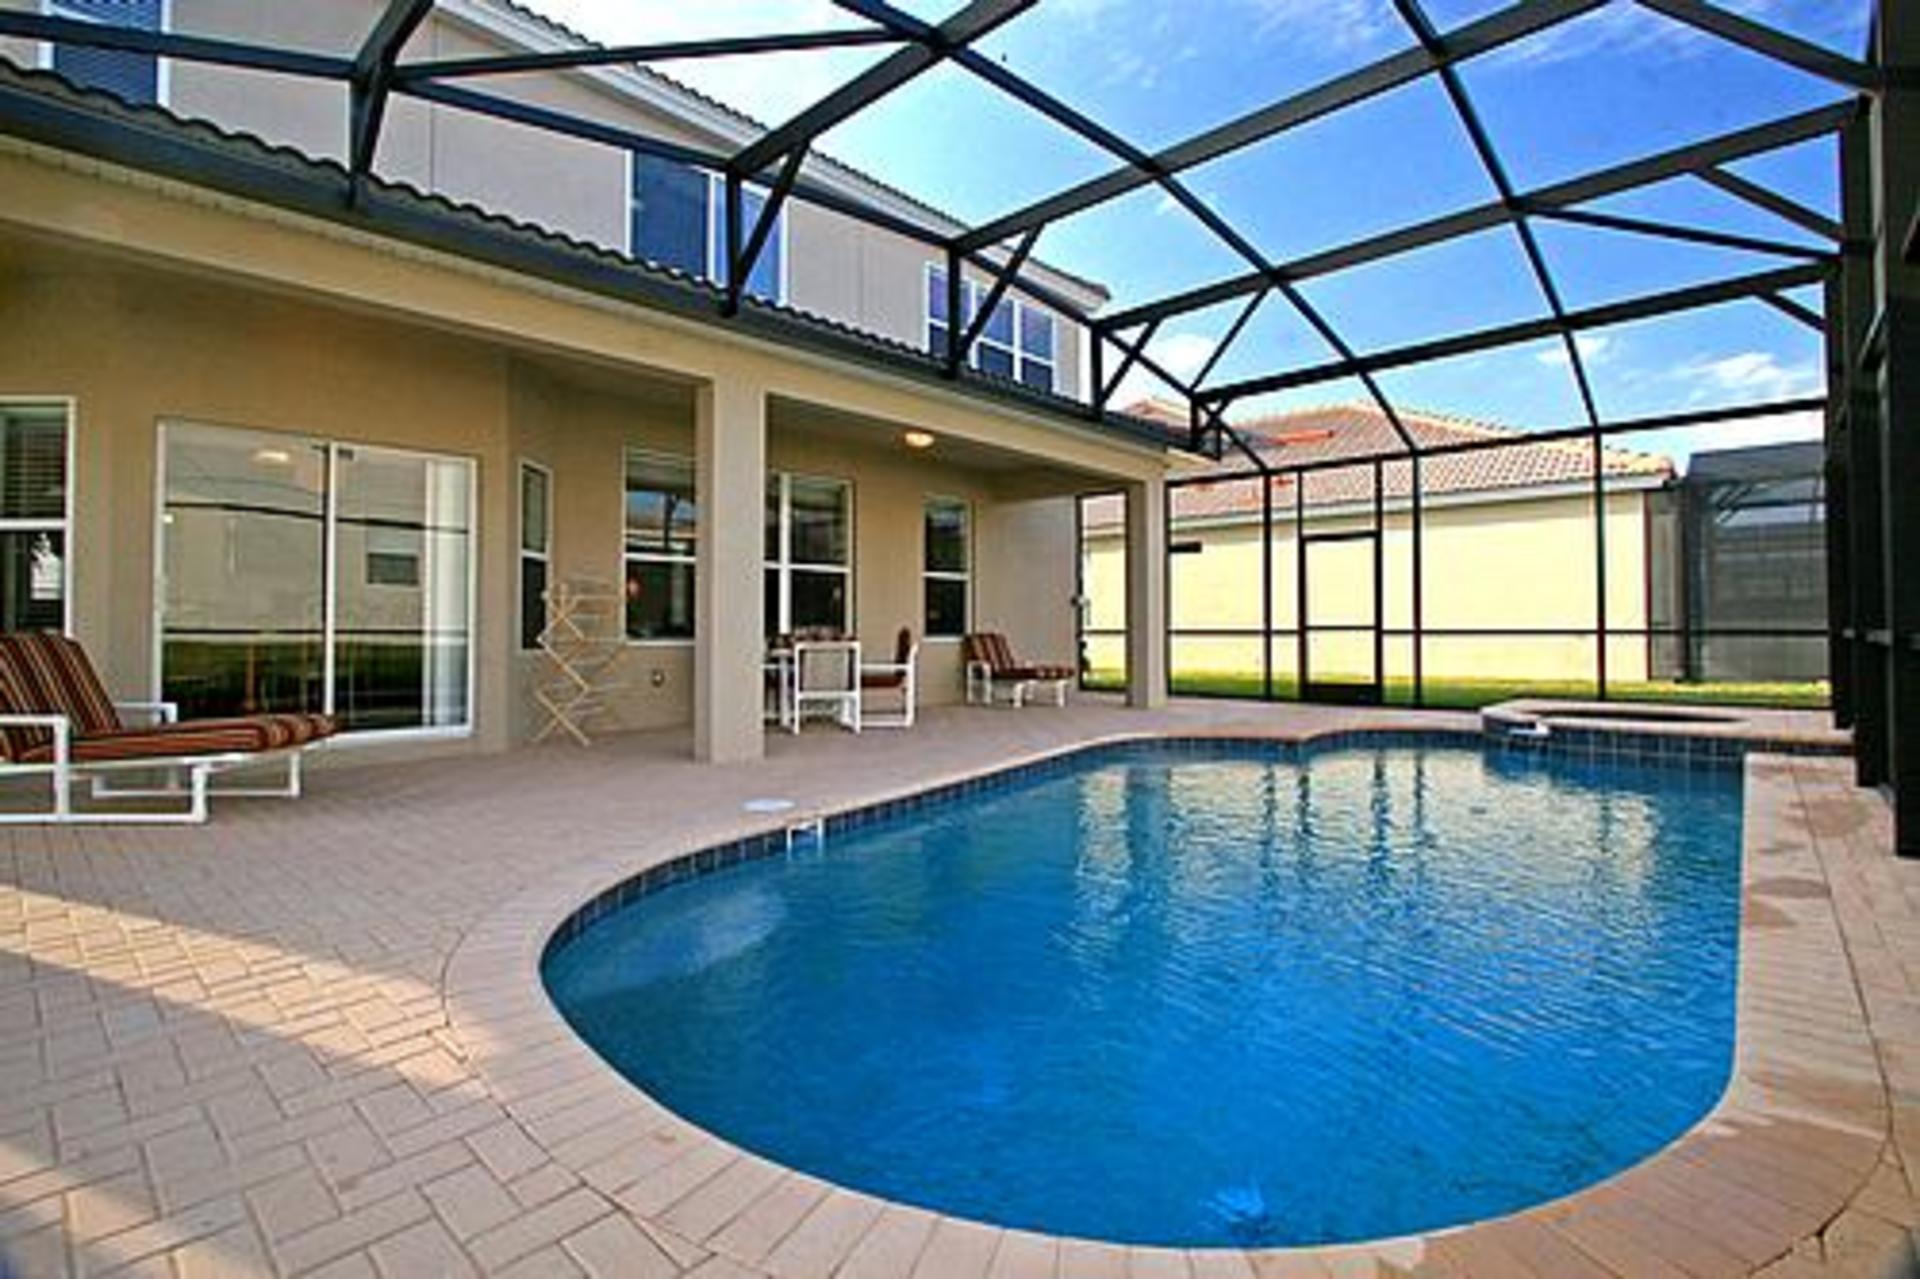 Enjoy a 5 Star Villa Holiday with your Family, Windsor Hills Resort, Villa Orlando 1459 photo 5803818